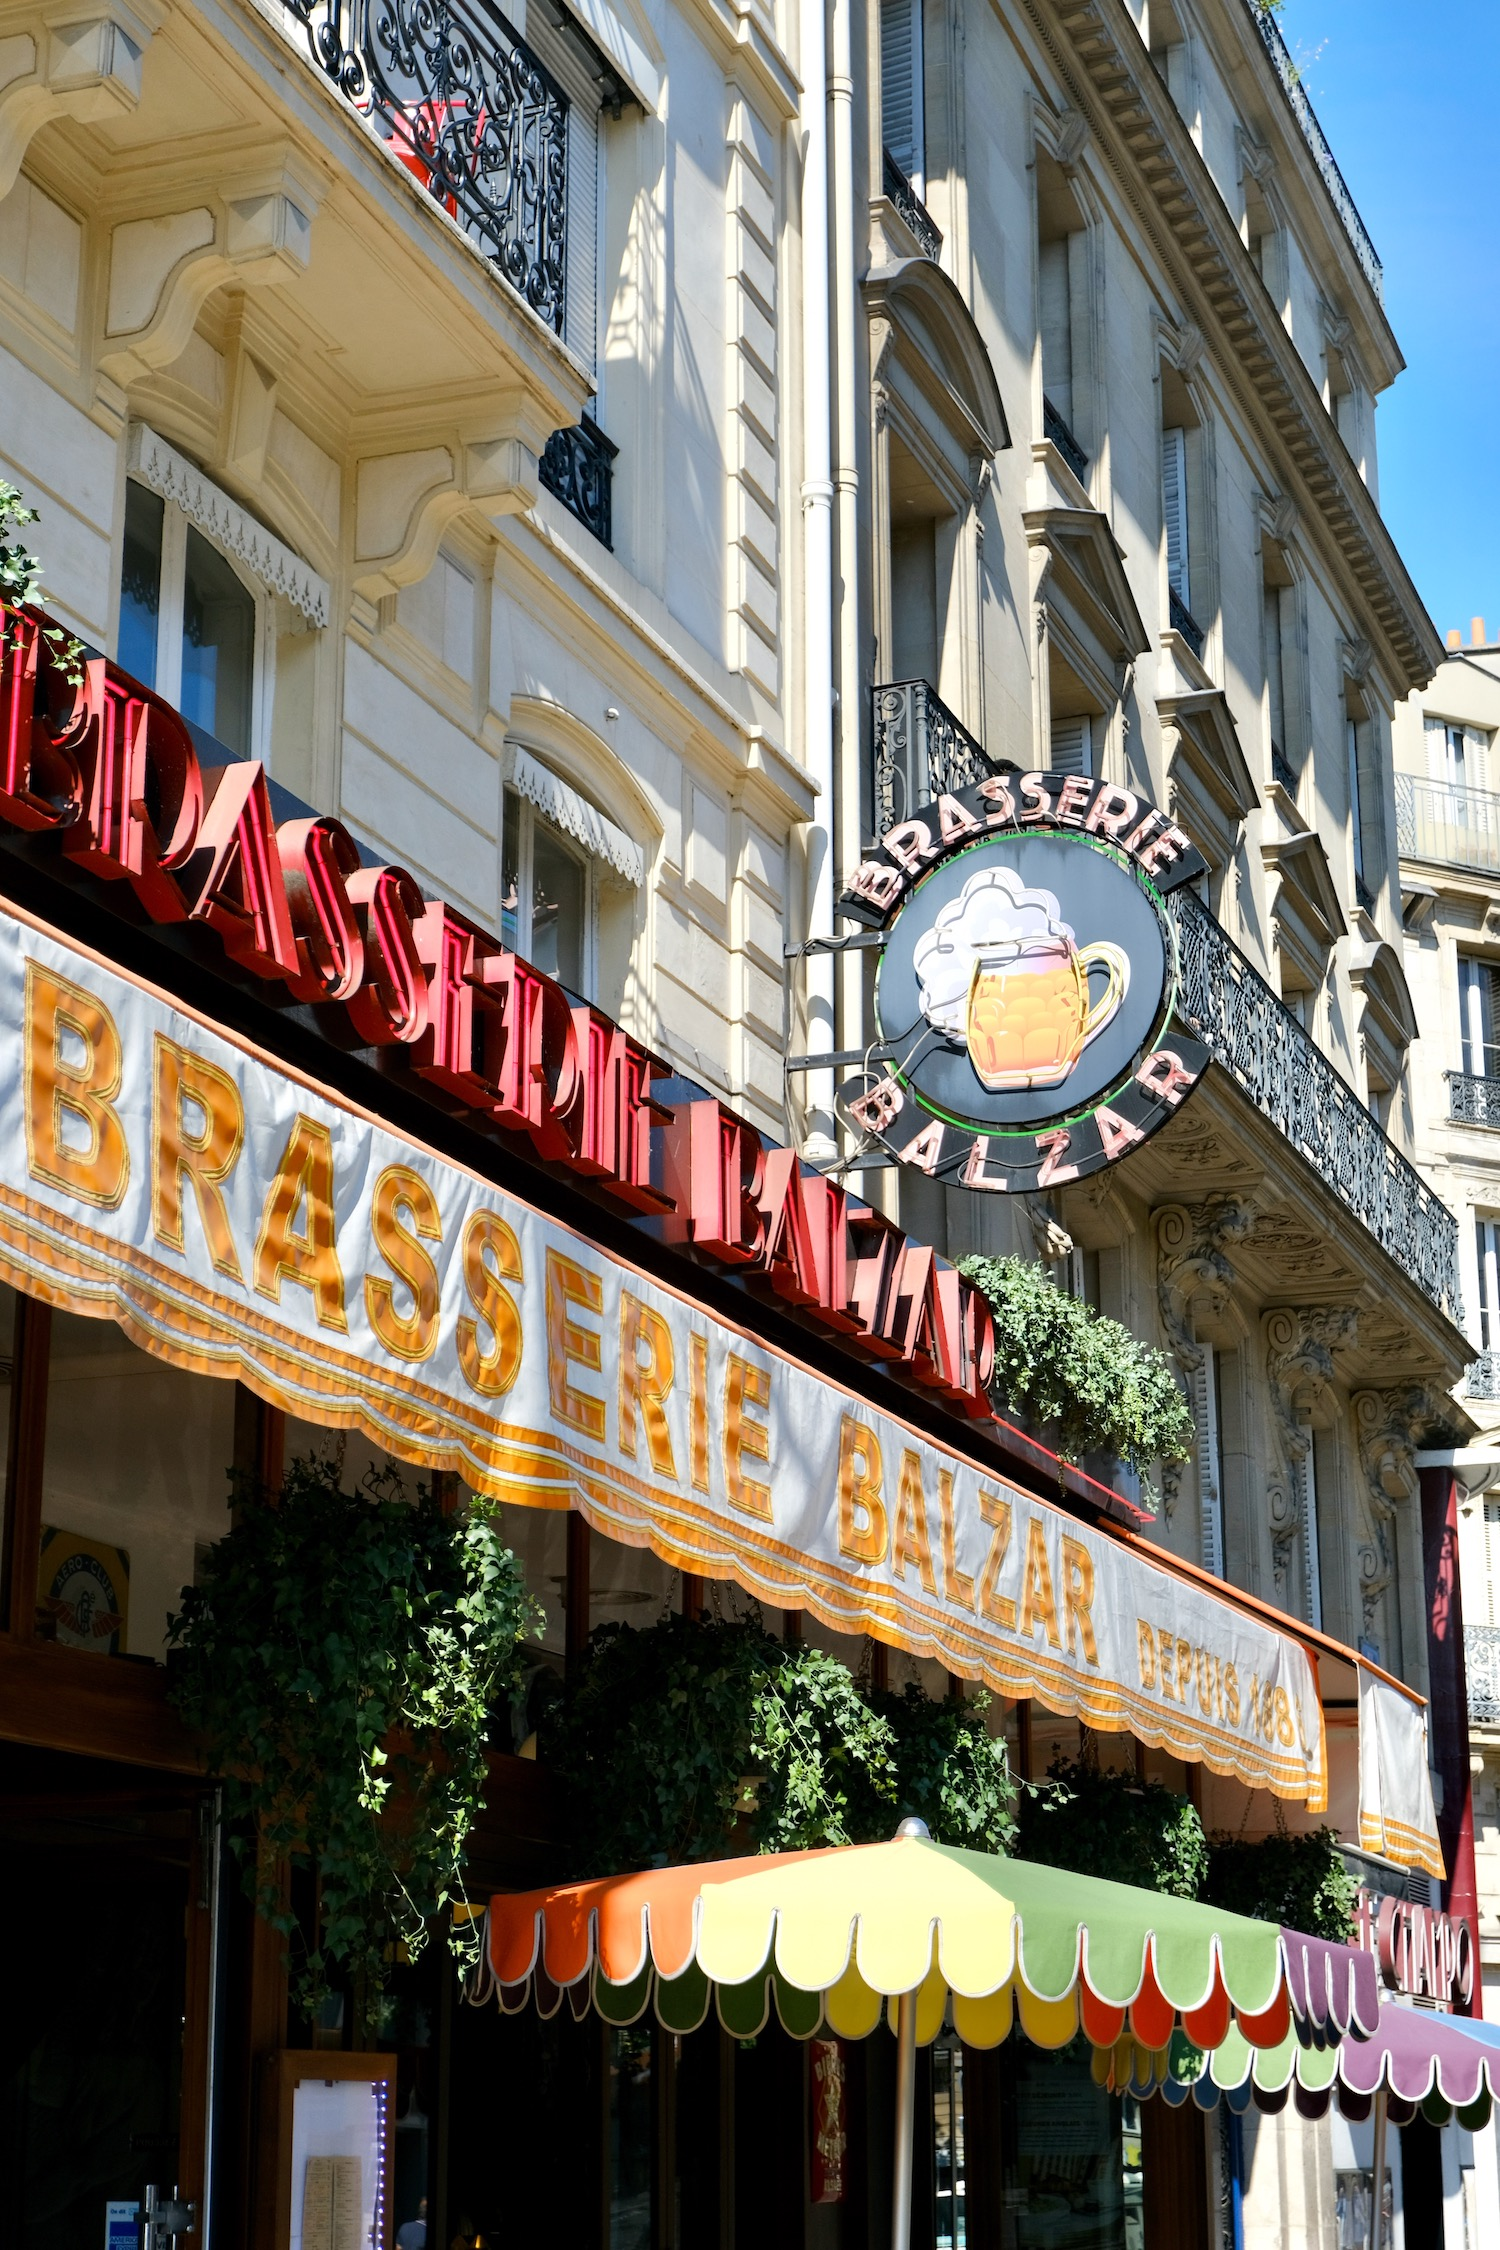 Brasserie Balzar exterior